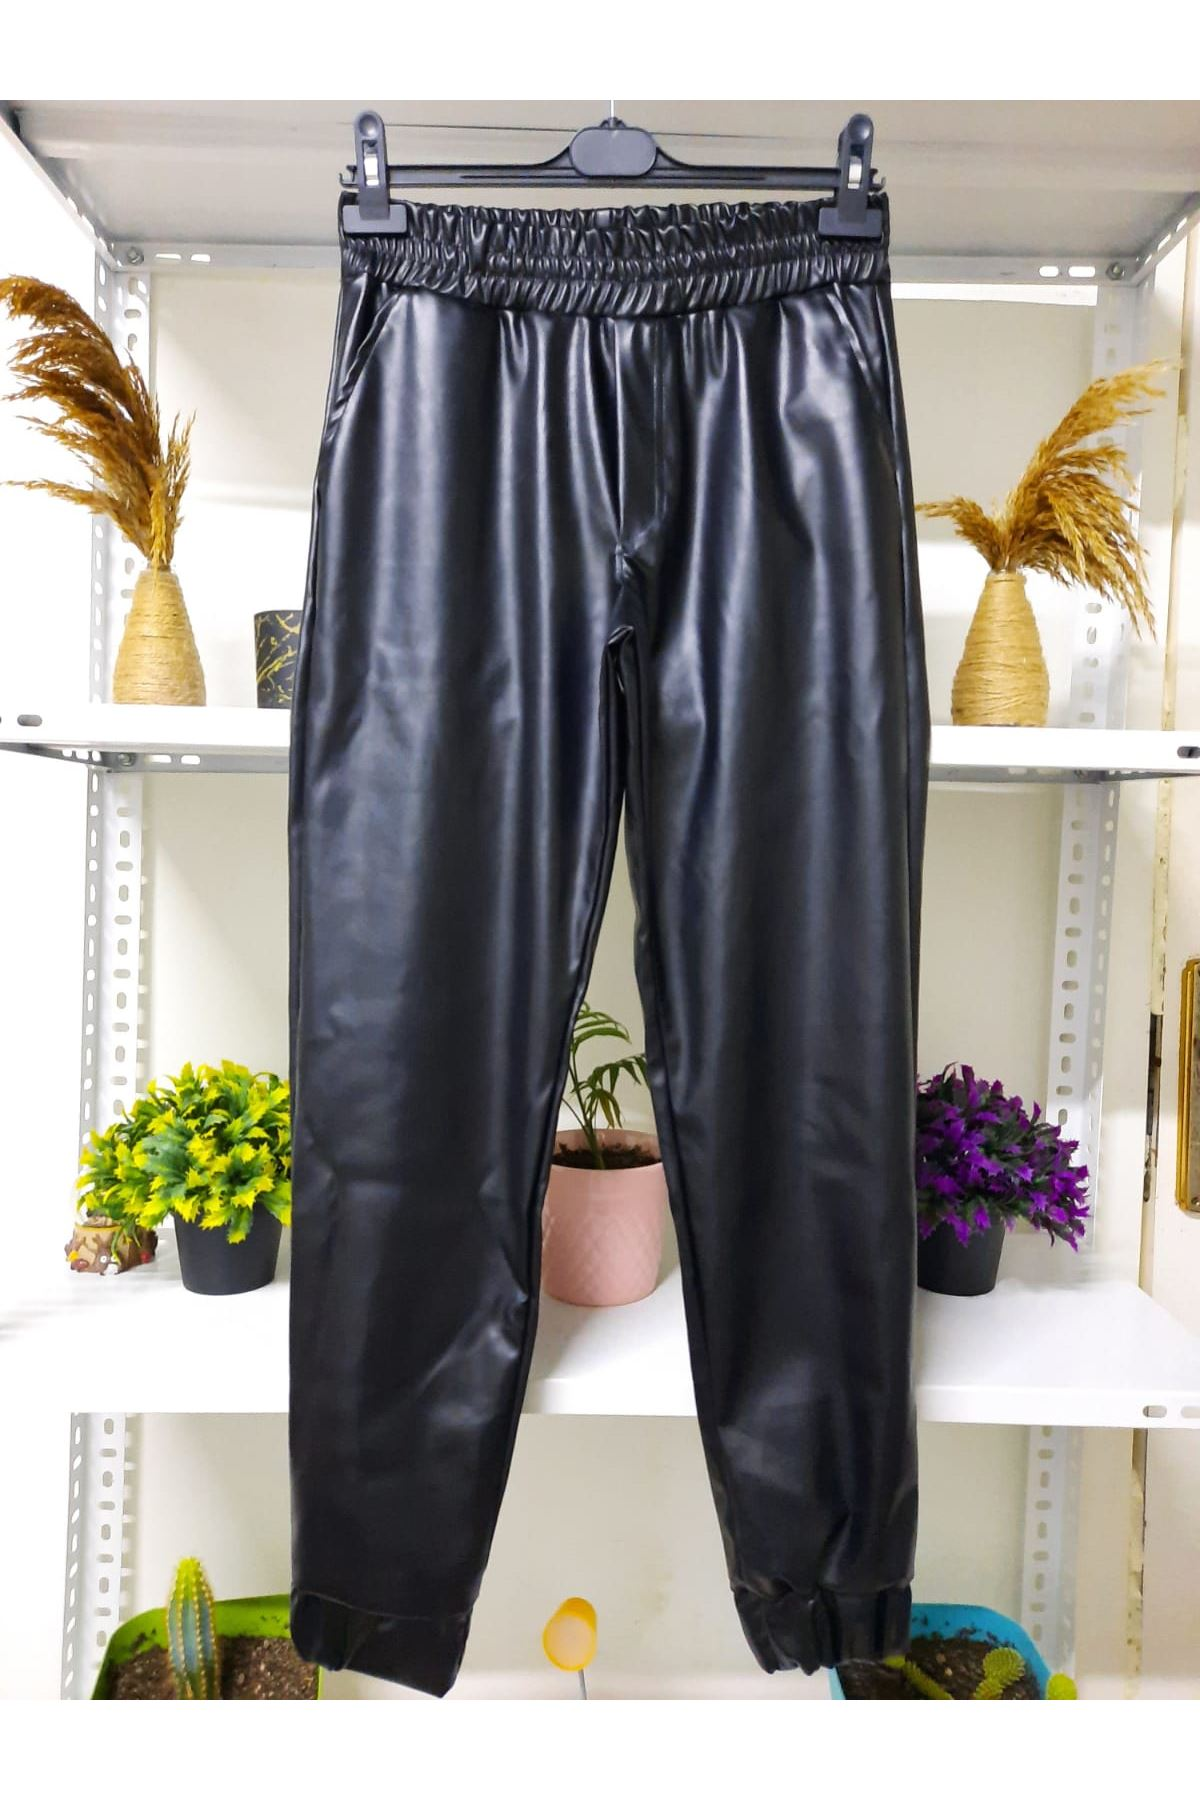 Bel ve Paça Lastik Deri Pantolon  - siyah